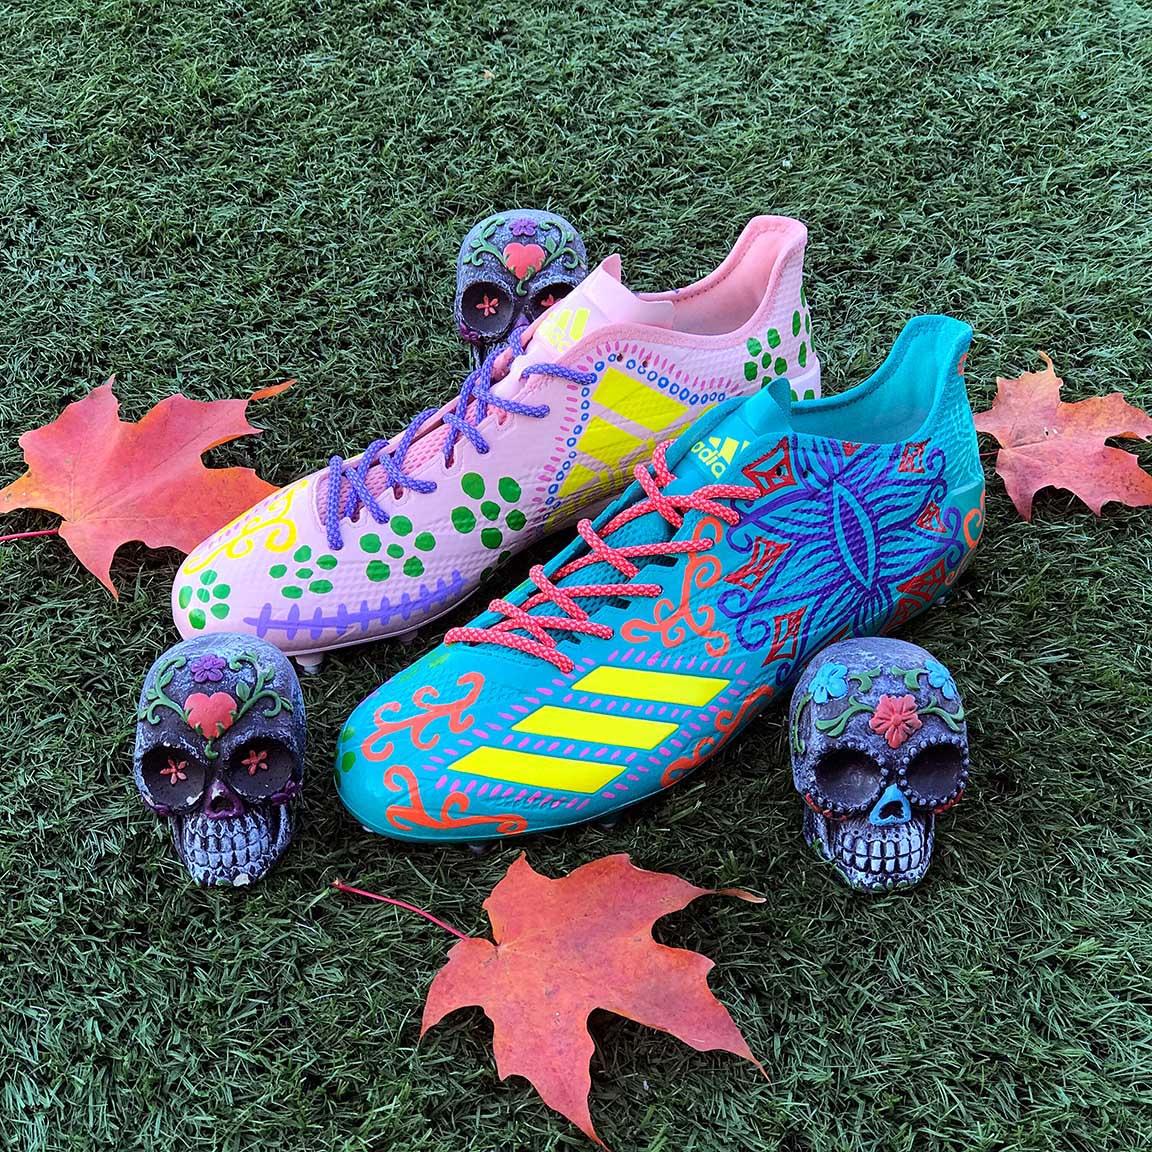 Adidas Adizero DeAndre Hopkins Halloween Cleats Front